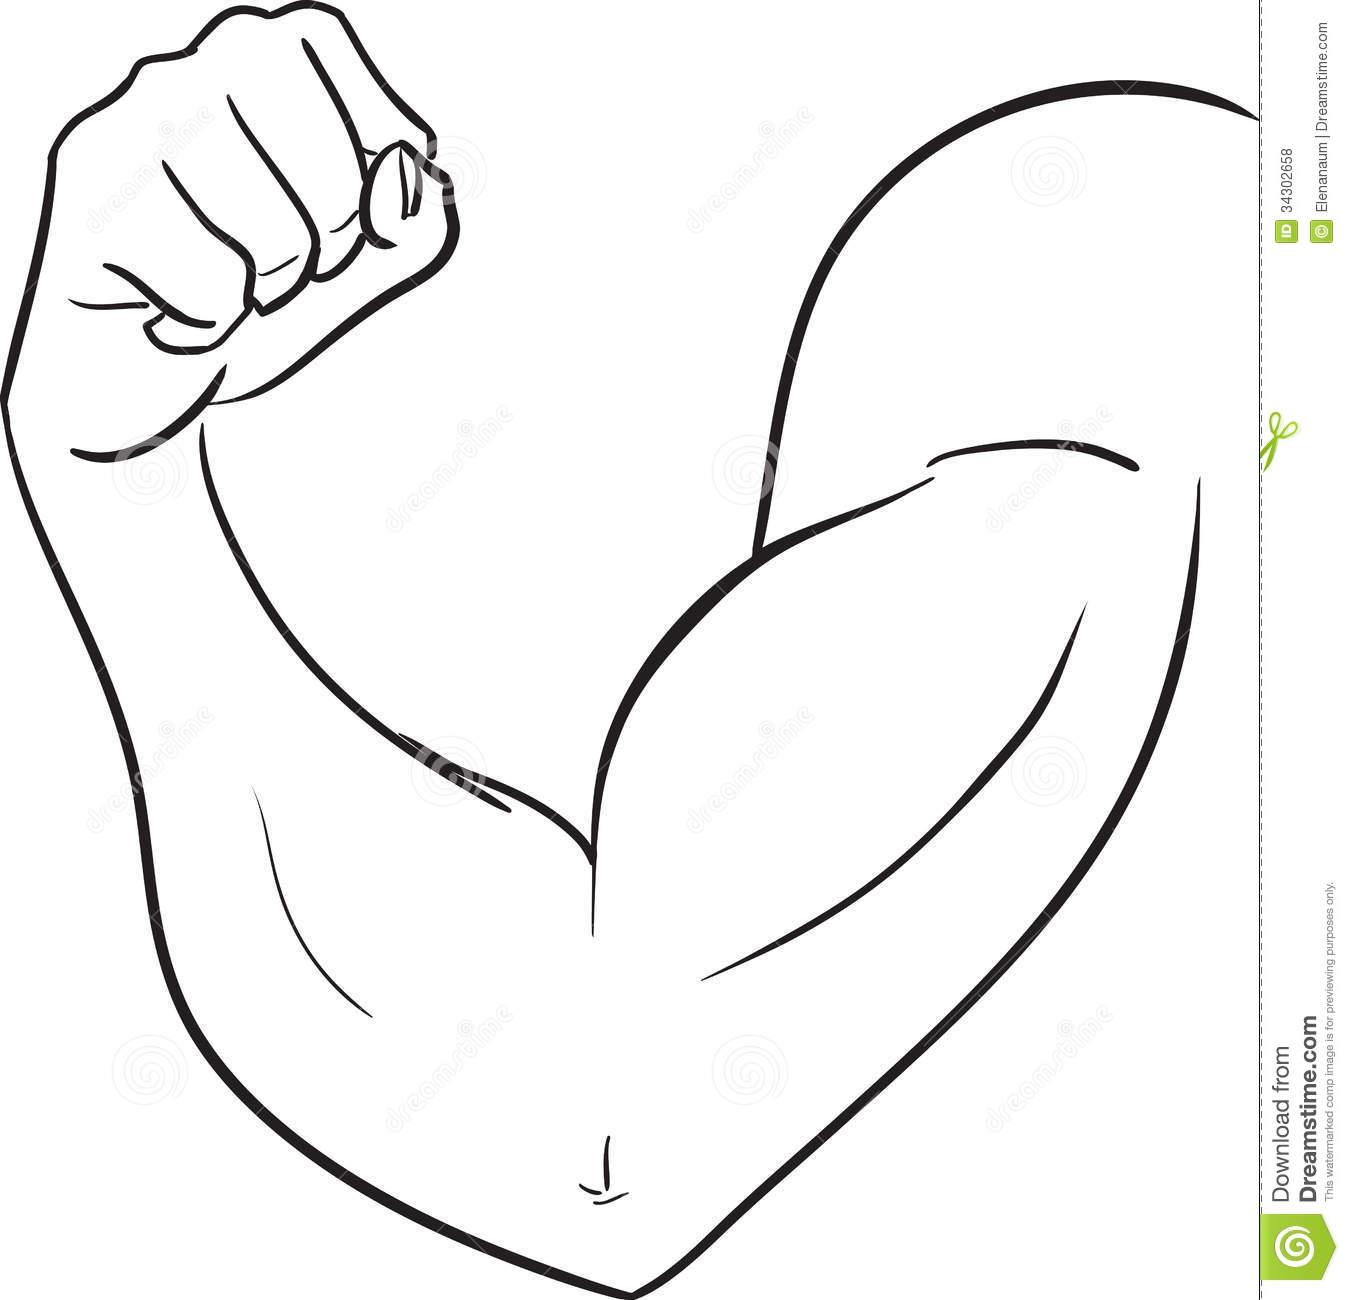 1349x1300 Cartoon Muscle Arm Clipart